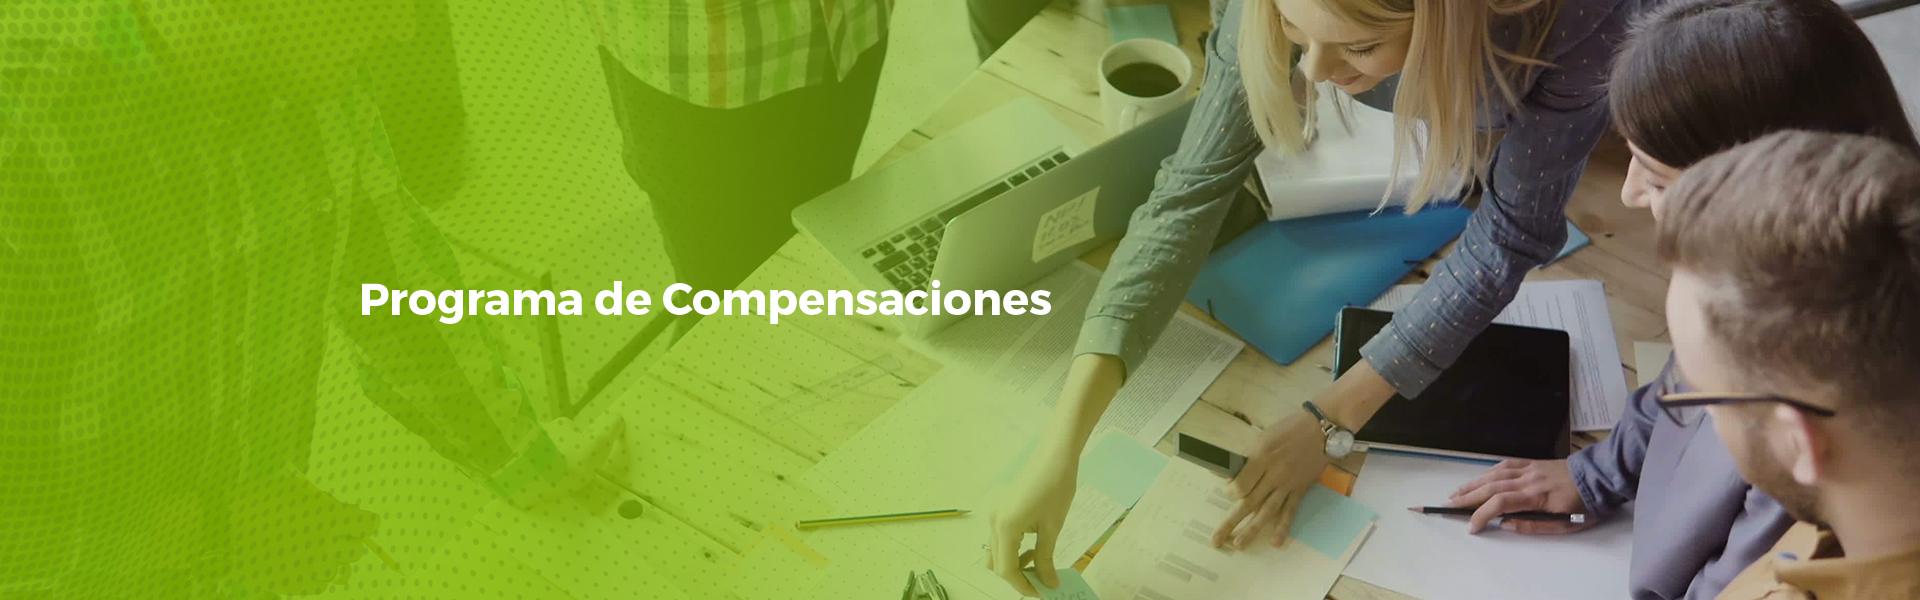 slide-programa-de-compensaciones